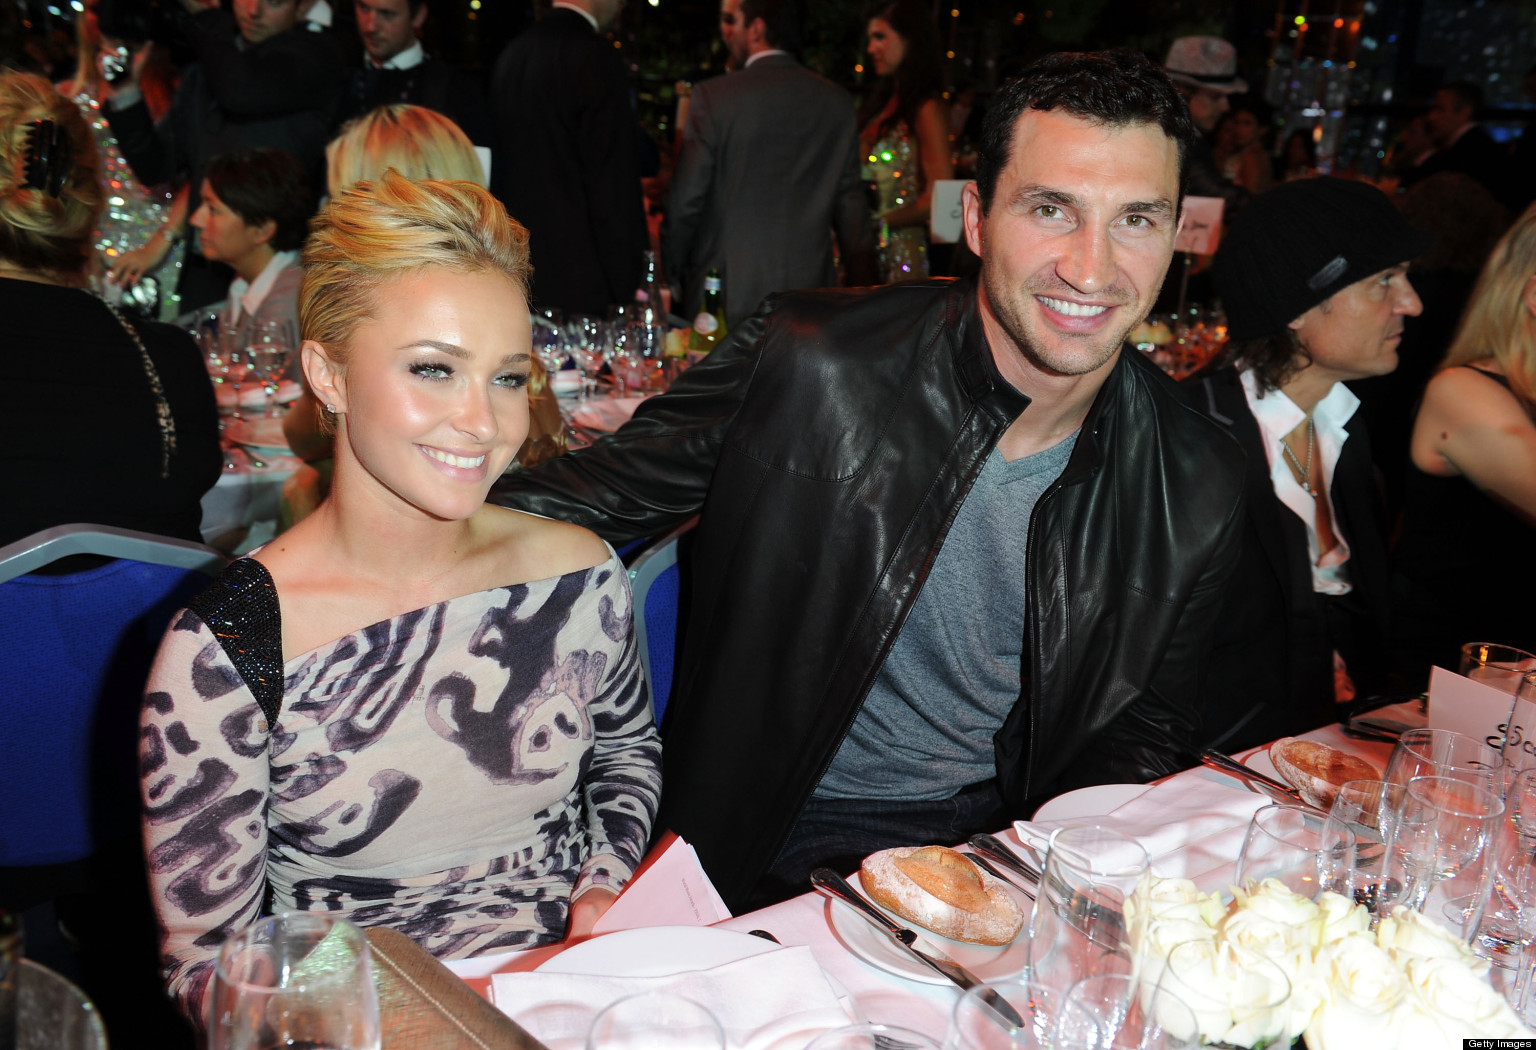 Hayden Panettiere Engaged? Actress, Wladimir Klitschko Reportedly Set To  Wed  Huffpost